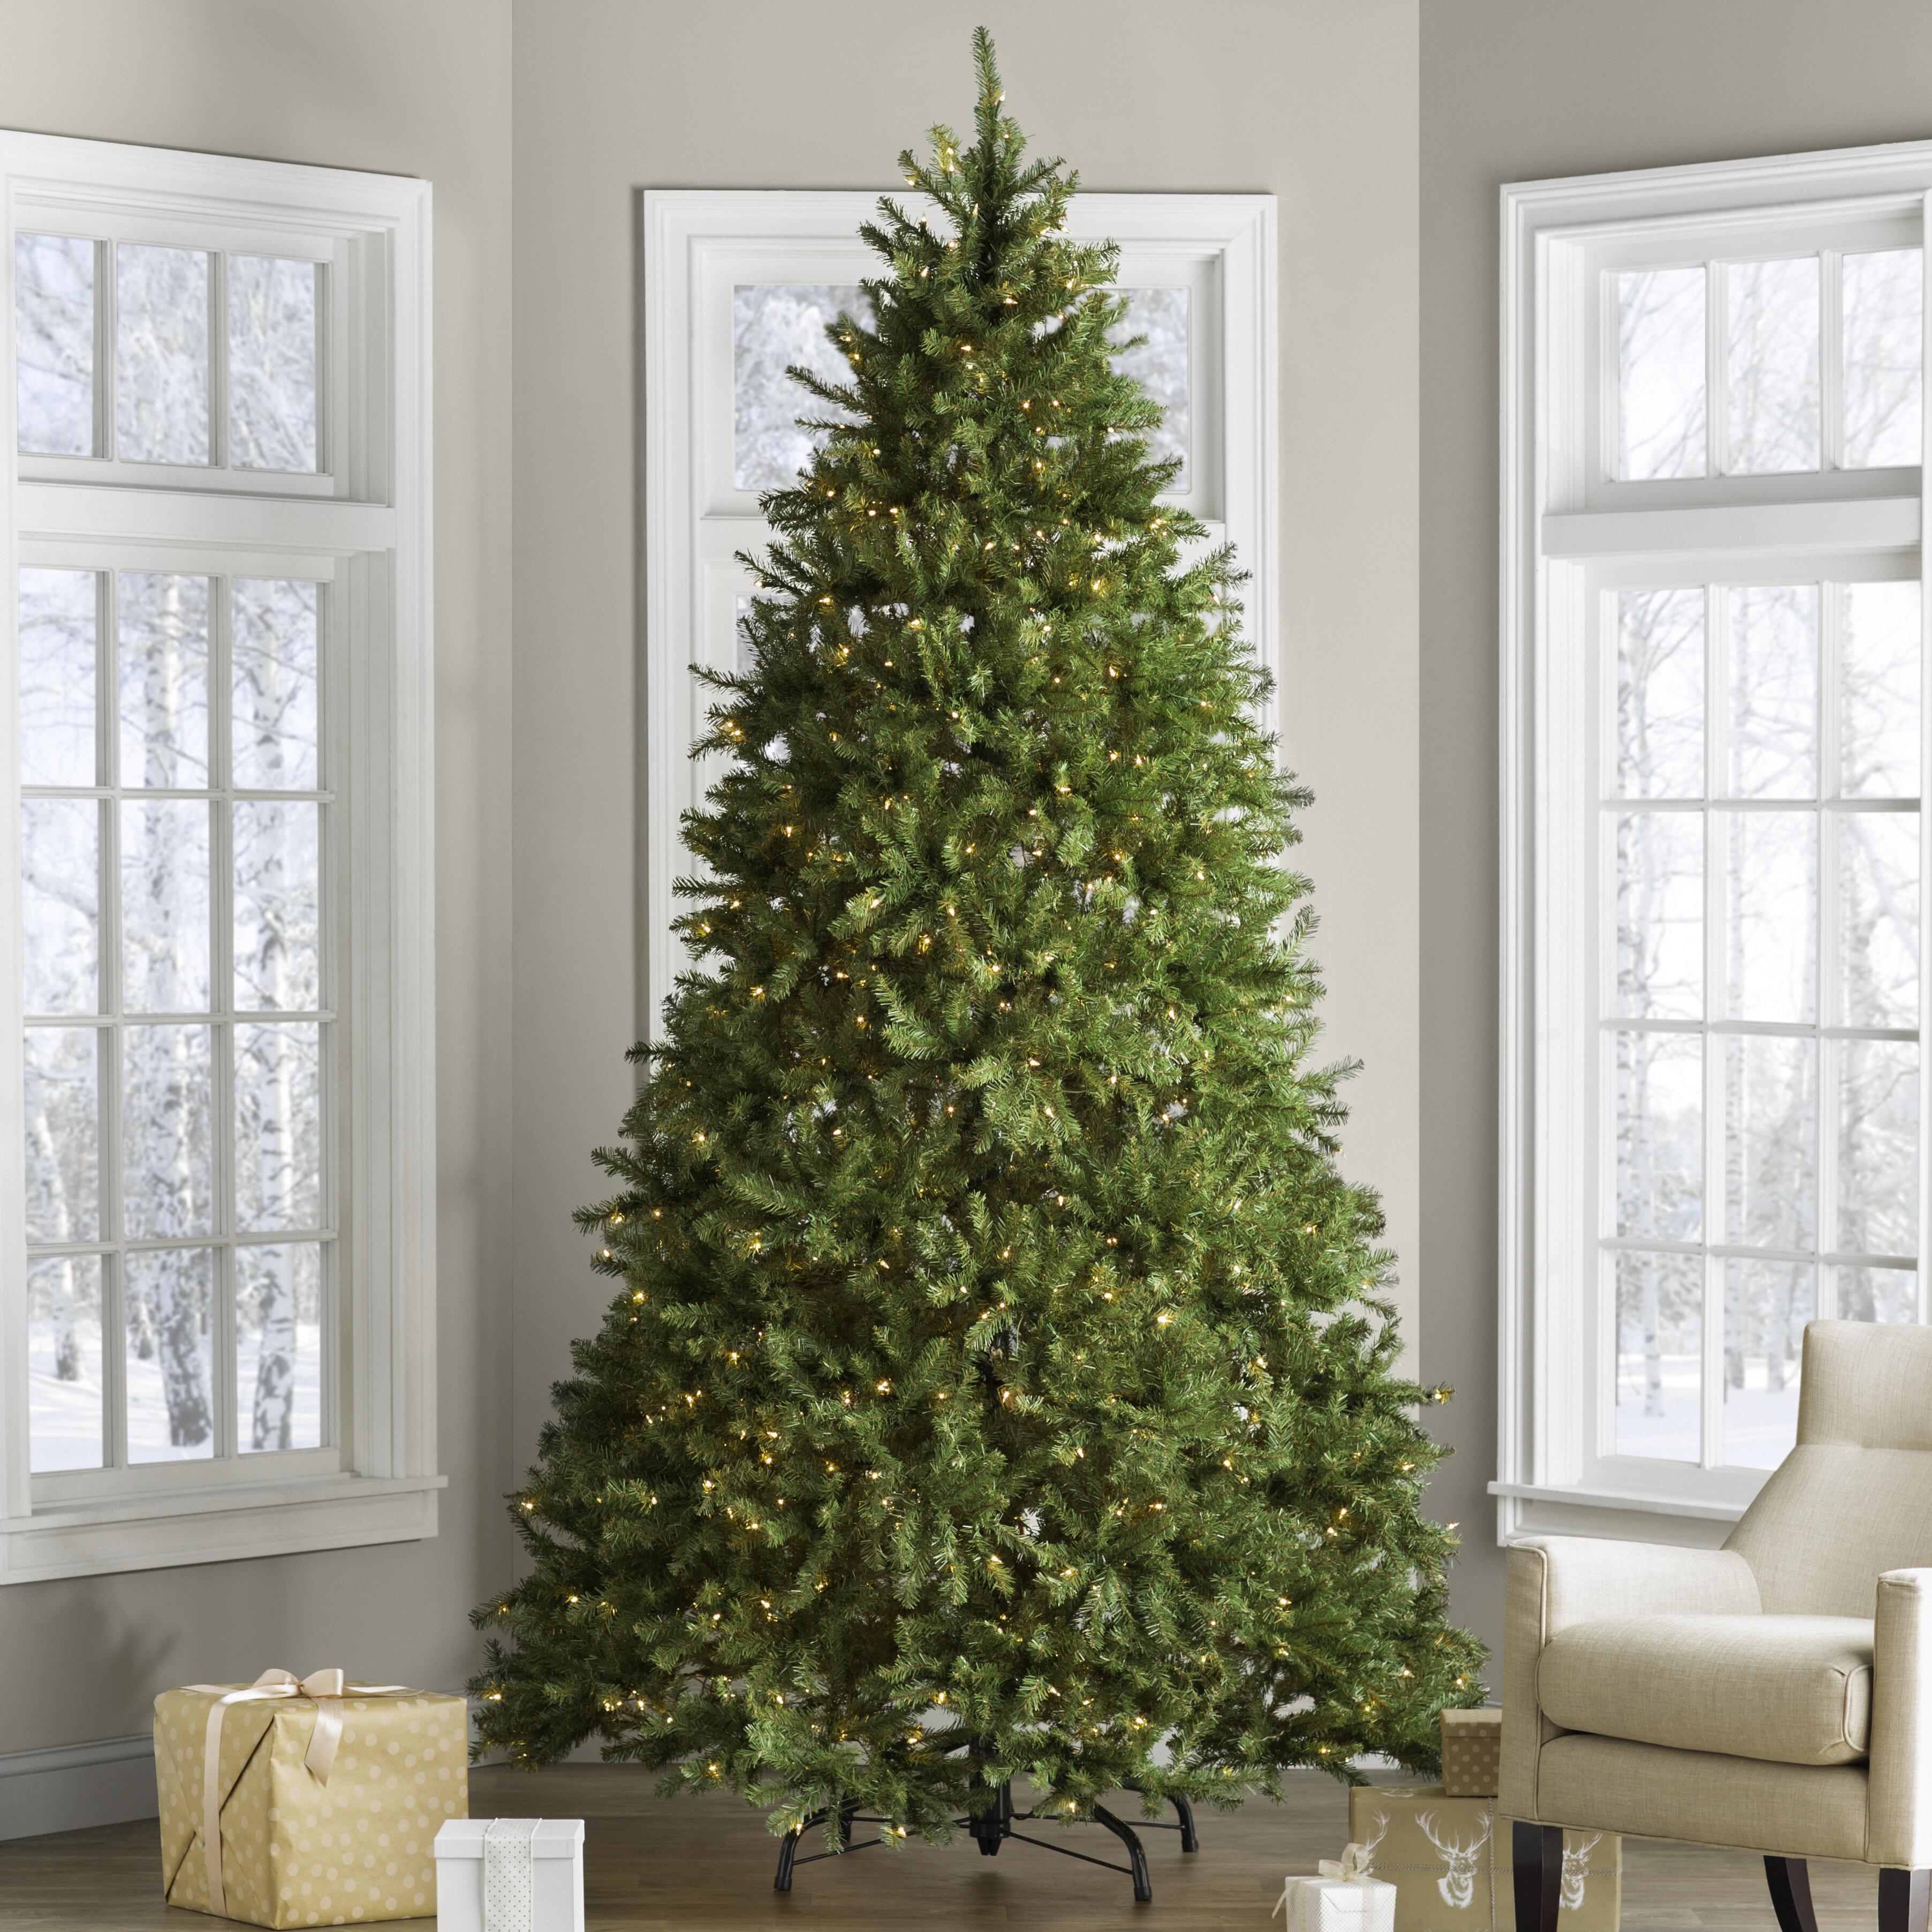 Loon Peak Hinged Fir Trees 9\' Green Fir Trees Artificial Christmas ...